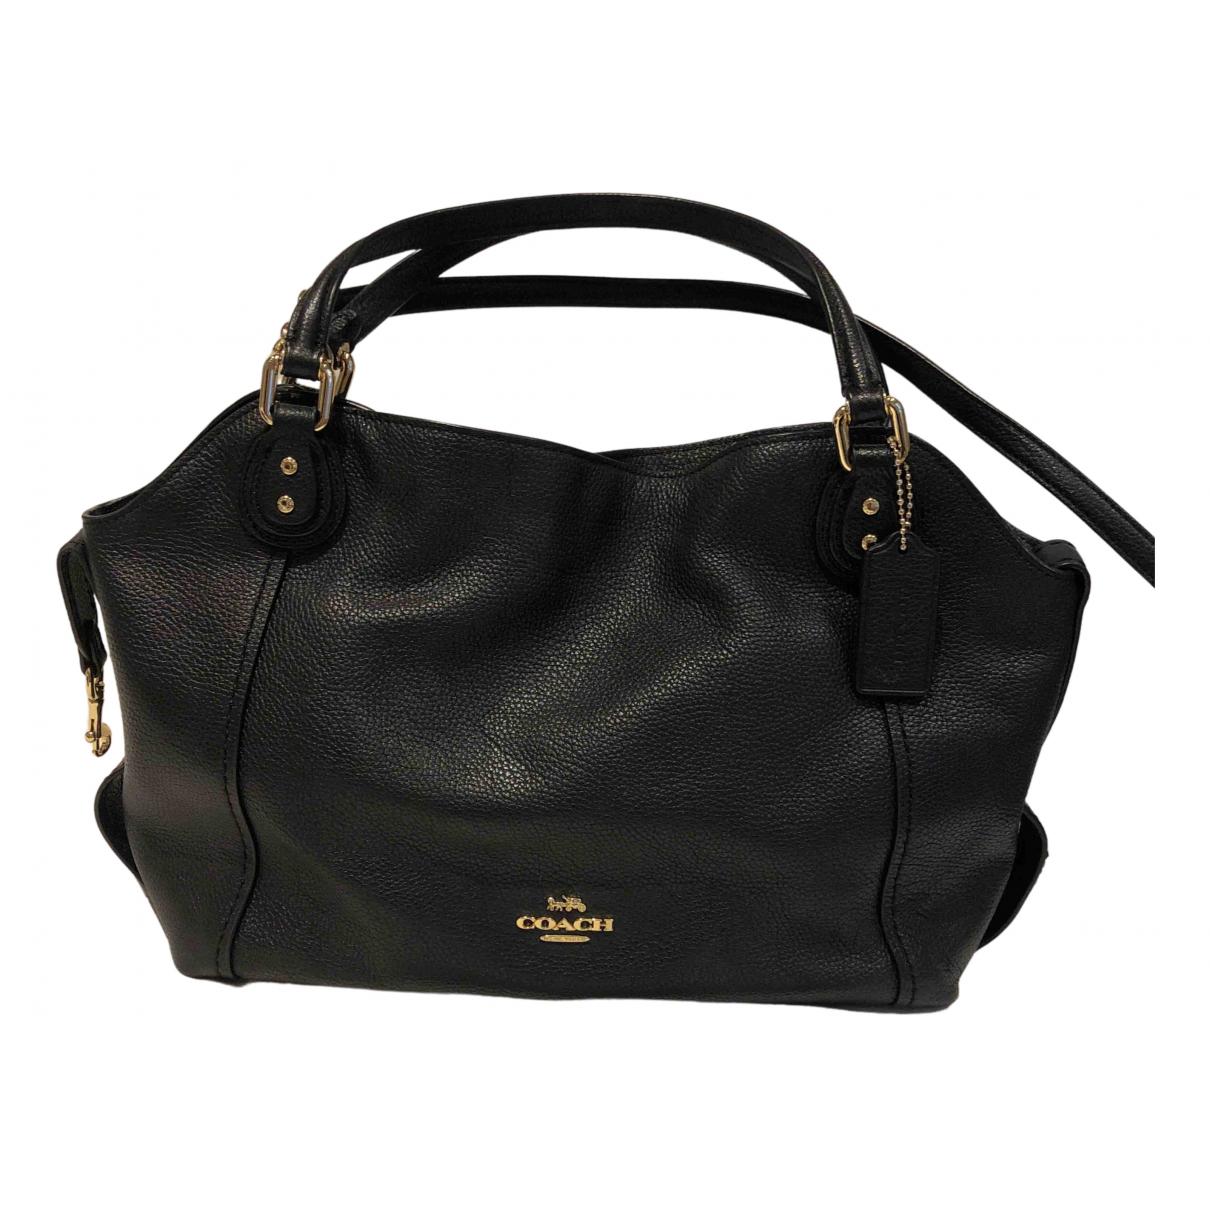 Coach Edie Black Leather Handbags